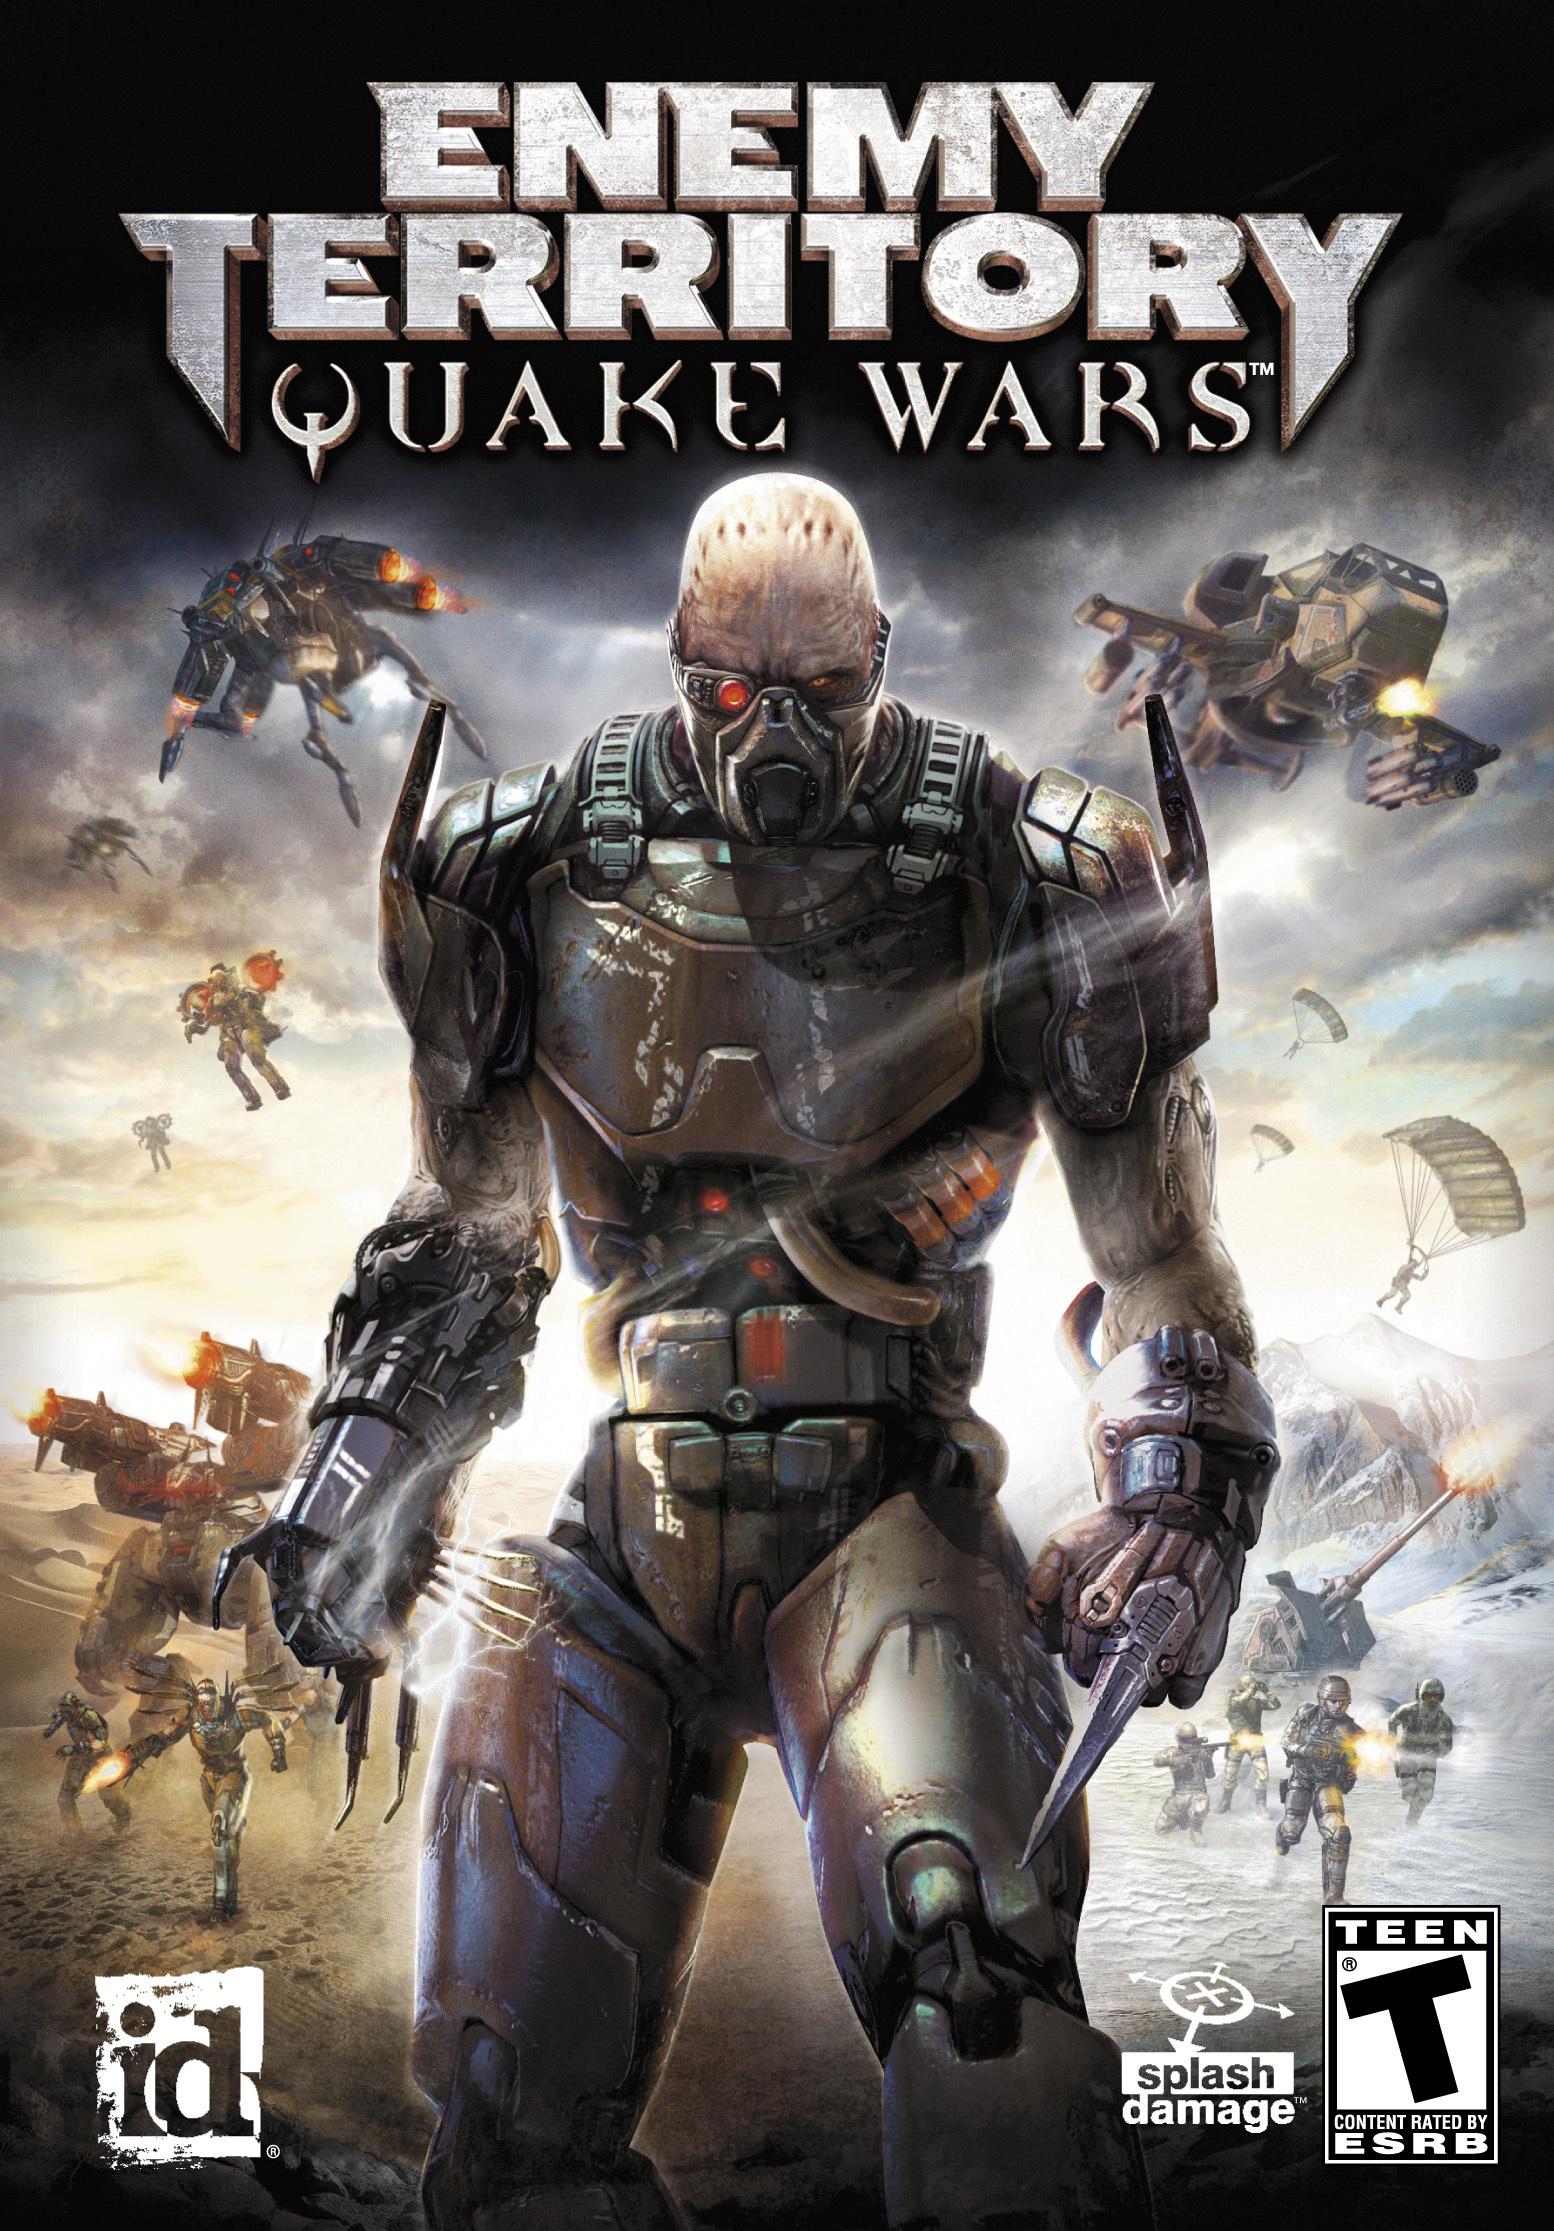 Enemy Territory: Quake Wars (Video Game 2007) - IMDb